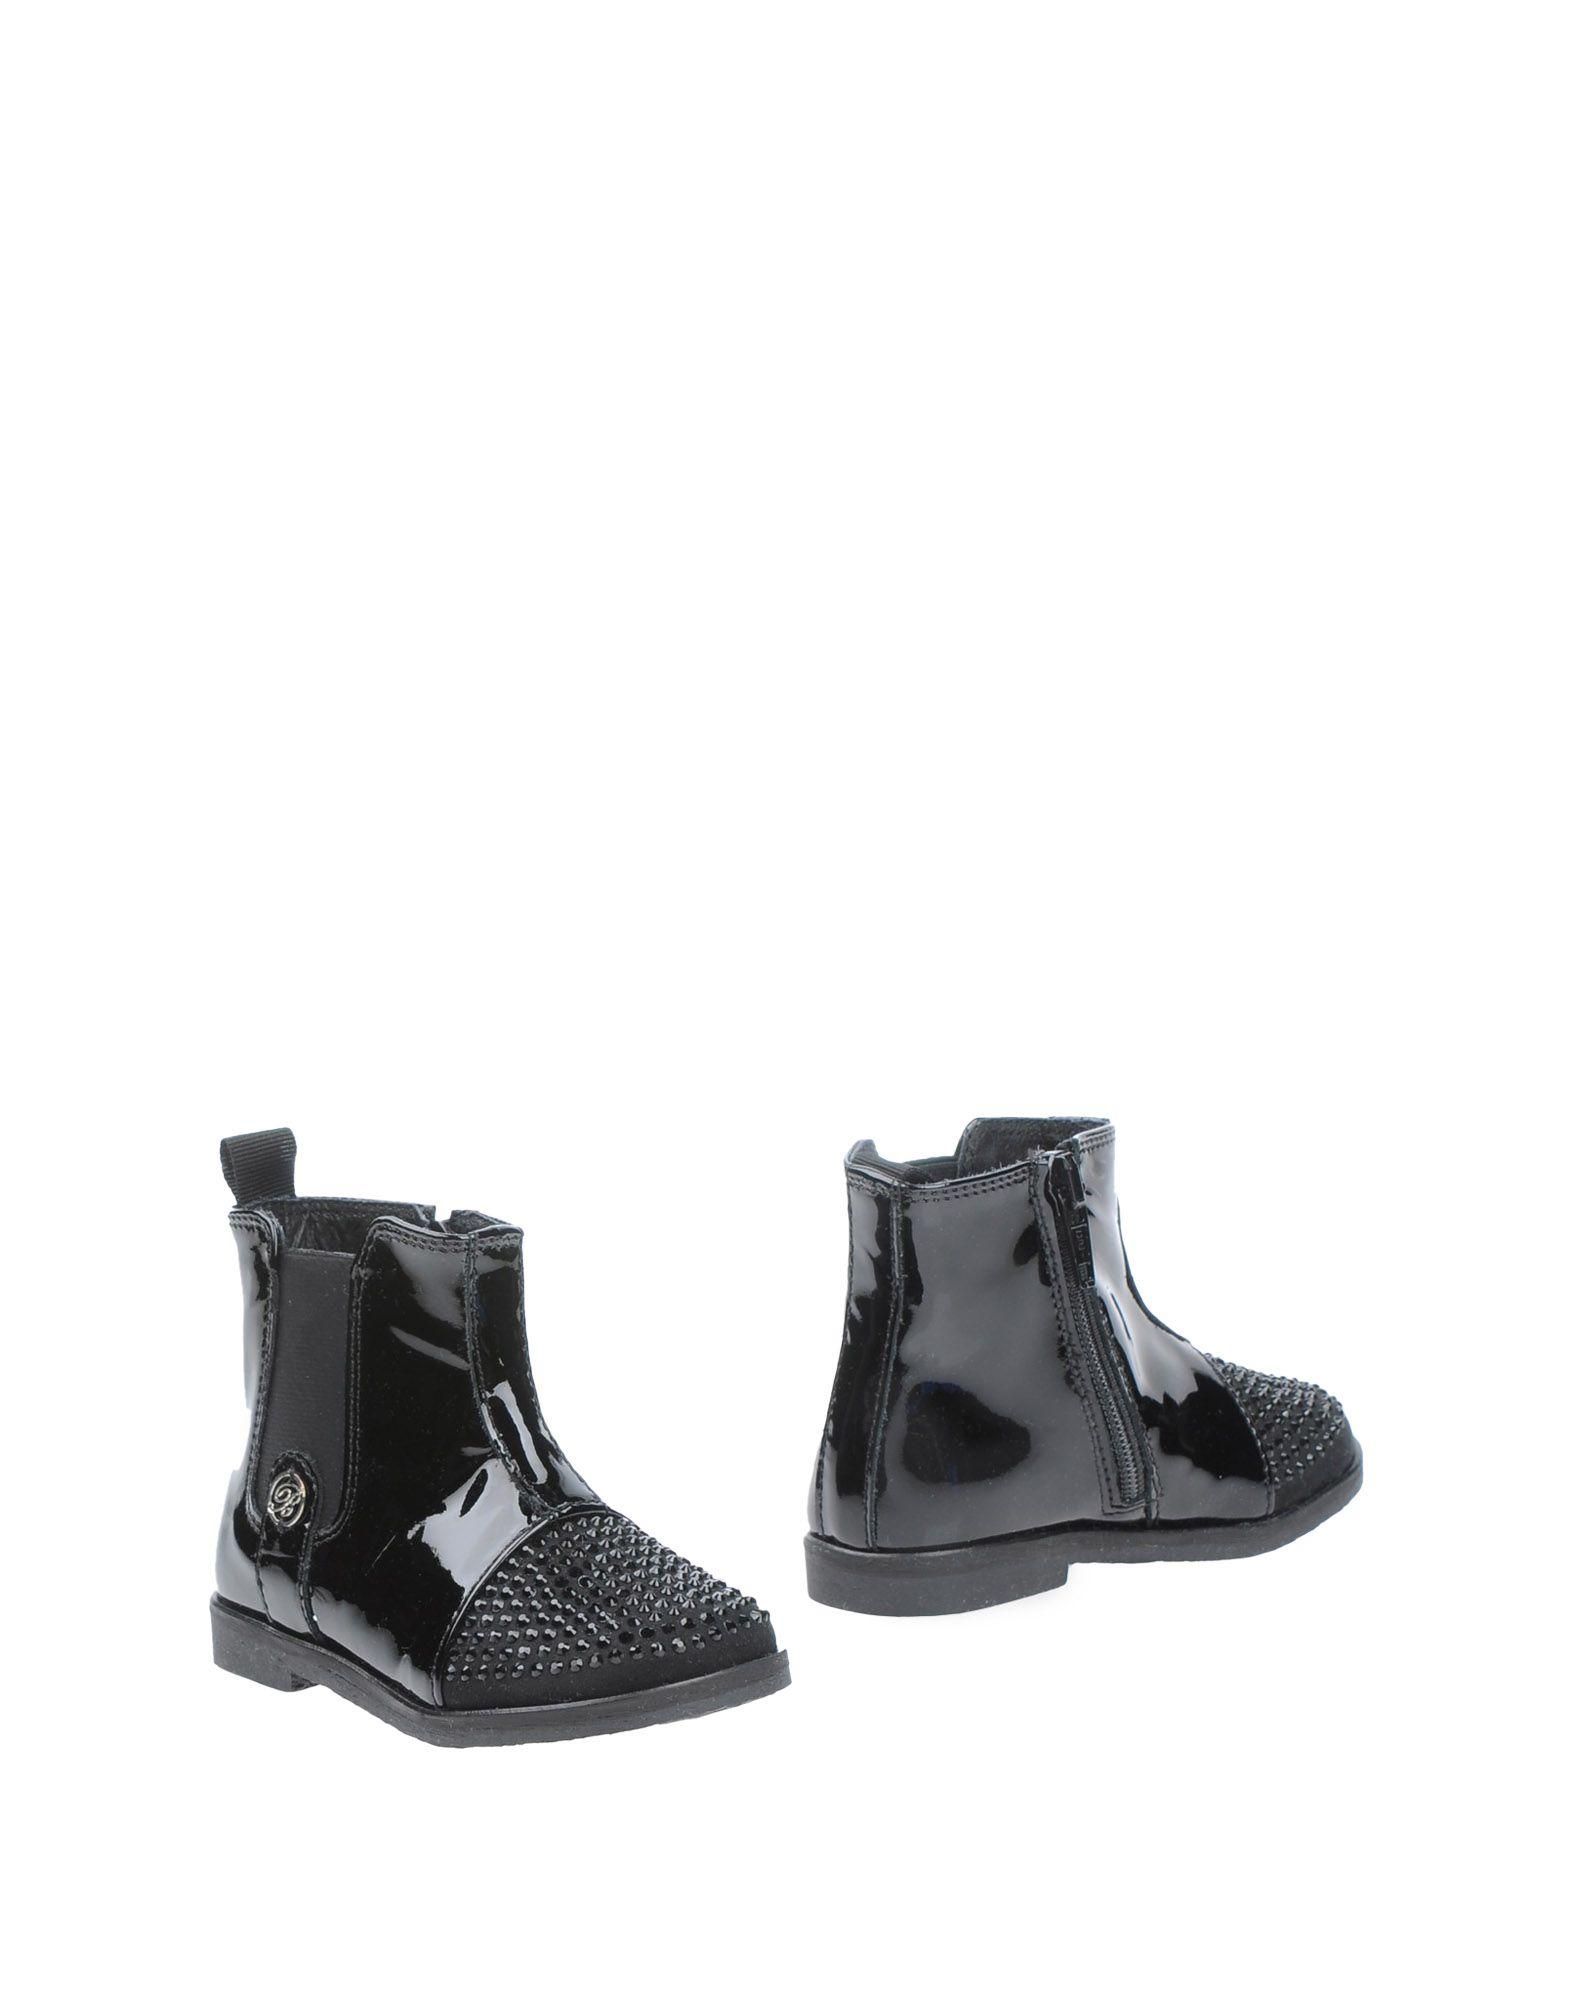 MISS BLUMARINE JEANS Полусапоги и высокие ботинки